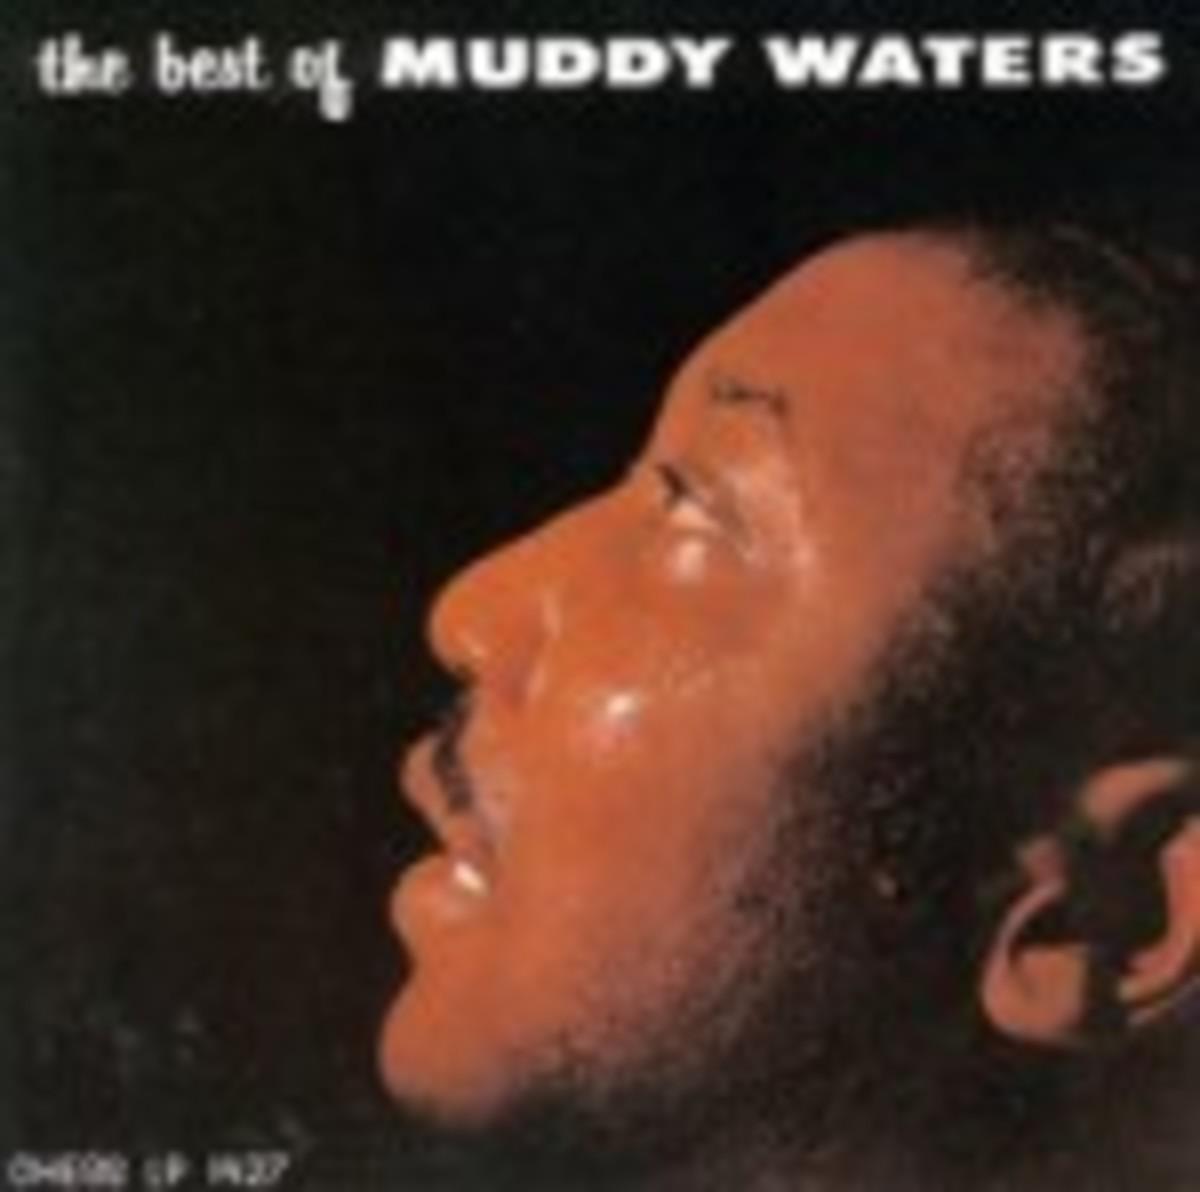 Muddy Waters The Best of Muddy Waters